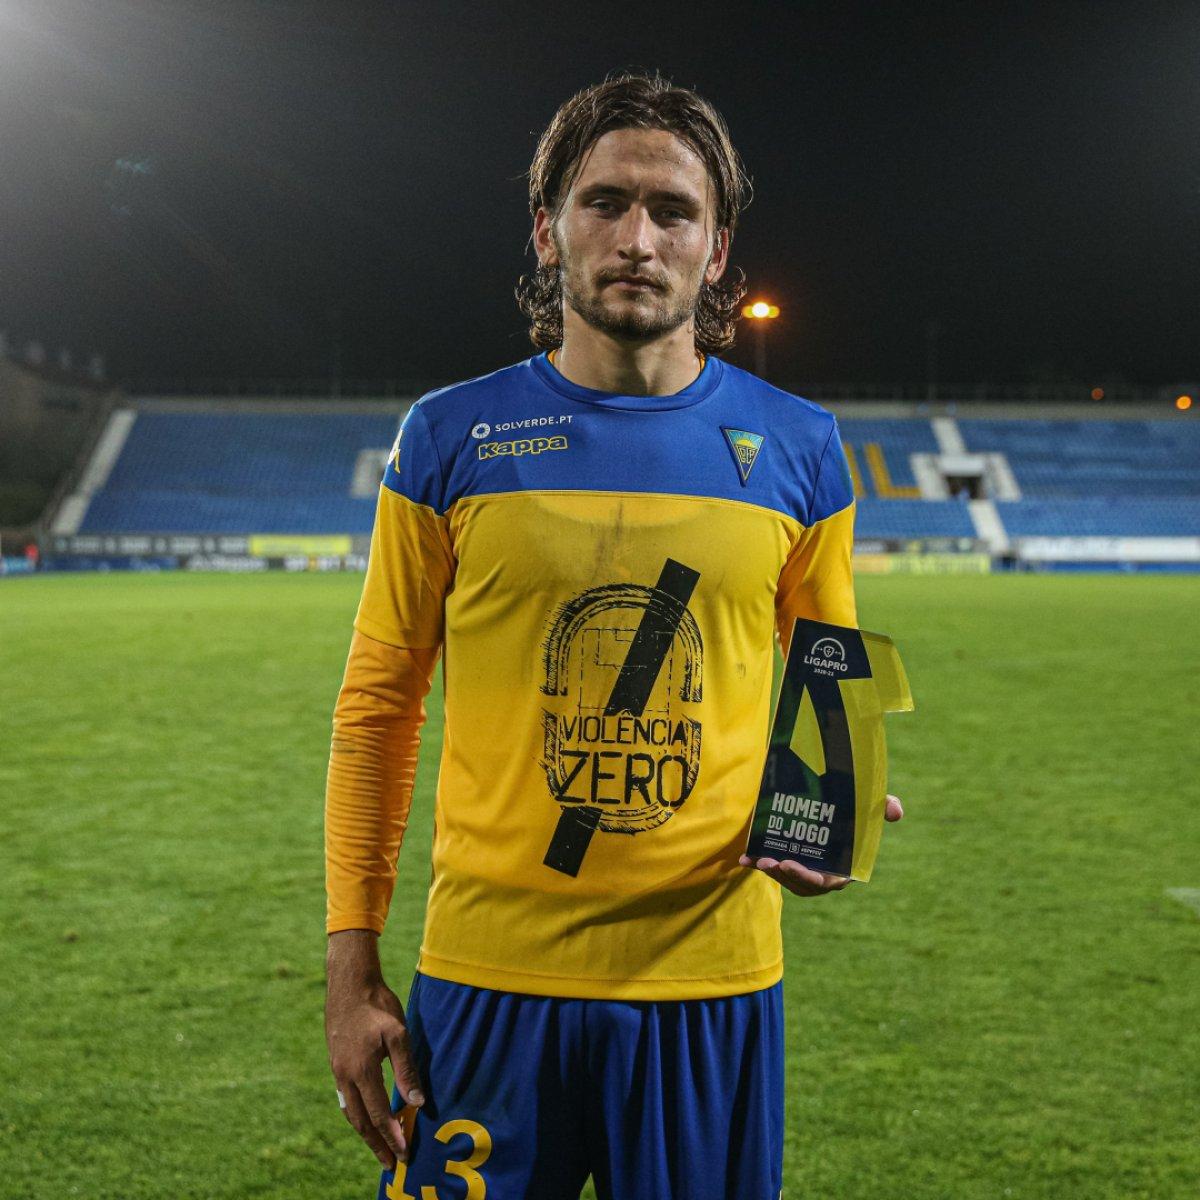 Fenerbahçe, Miguel Crespo yu İstanbul a getiriyor #2